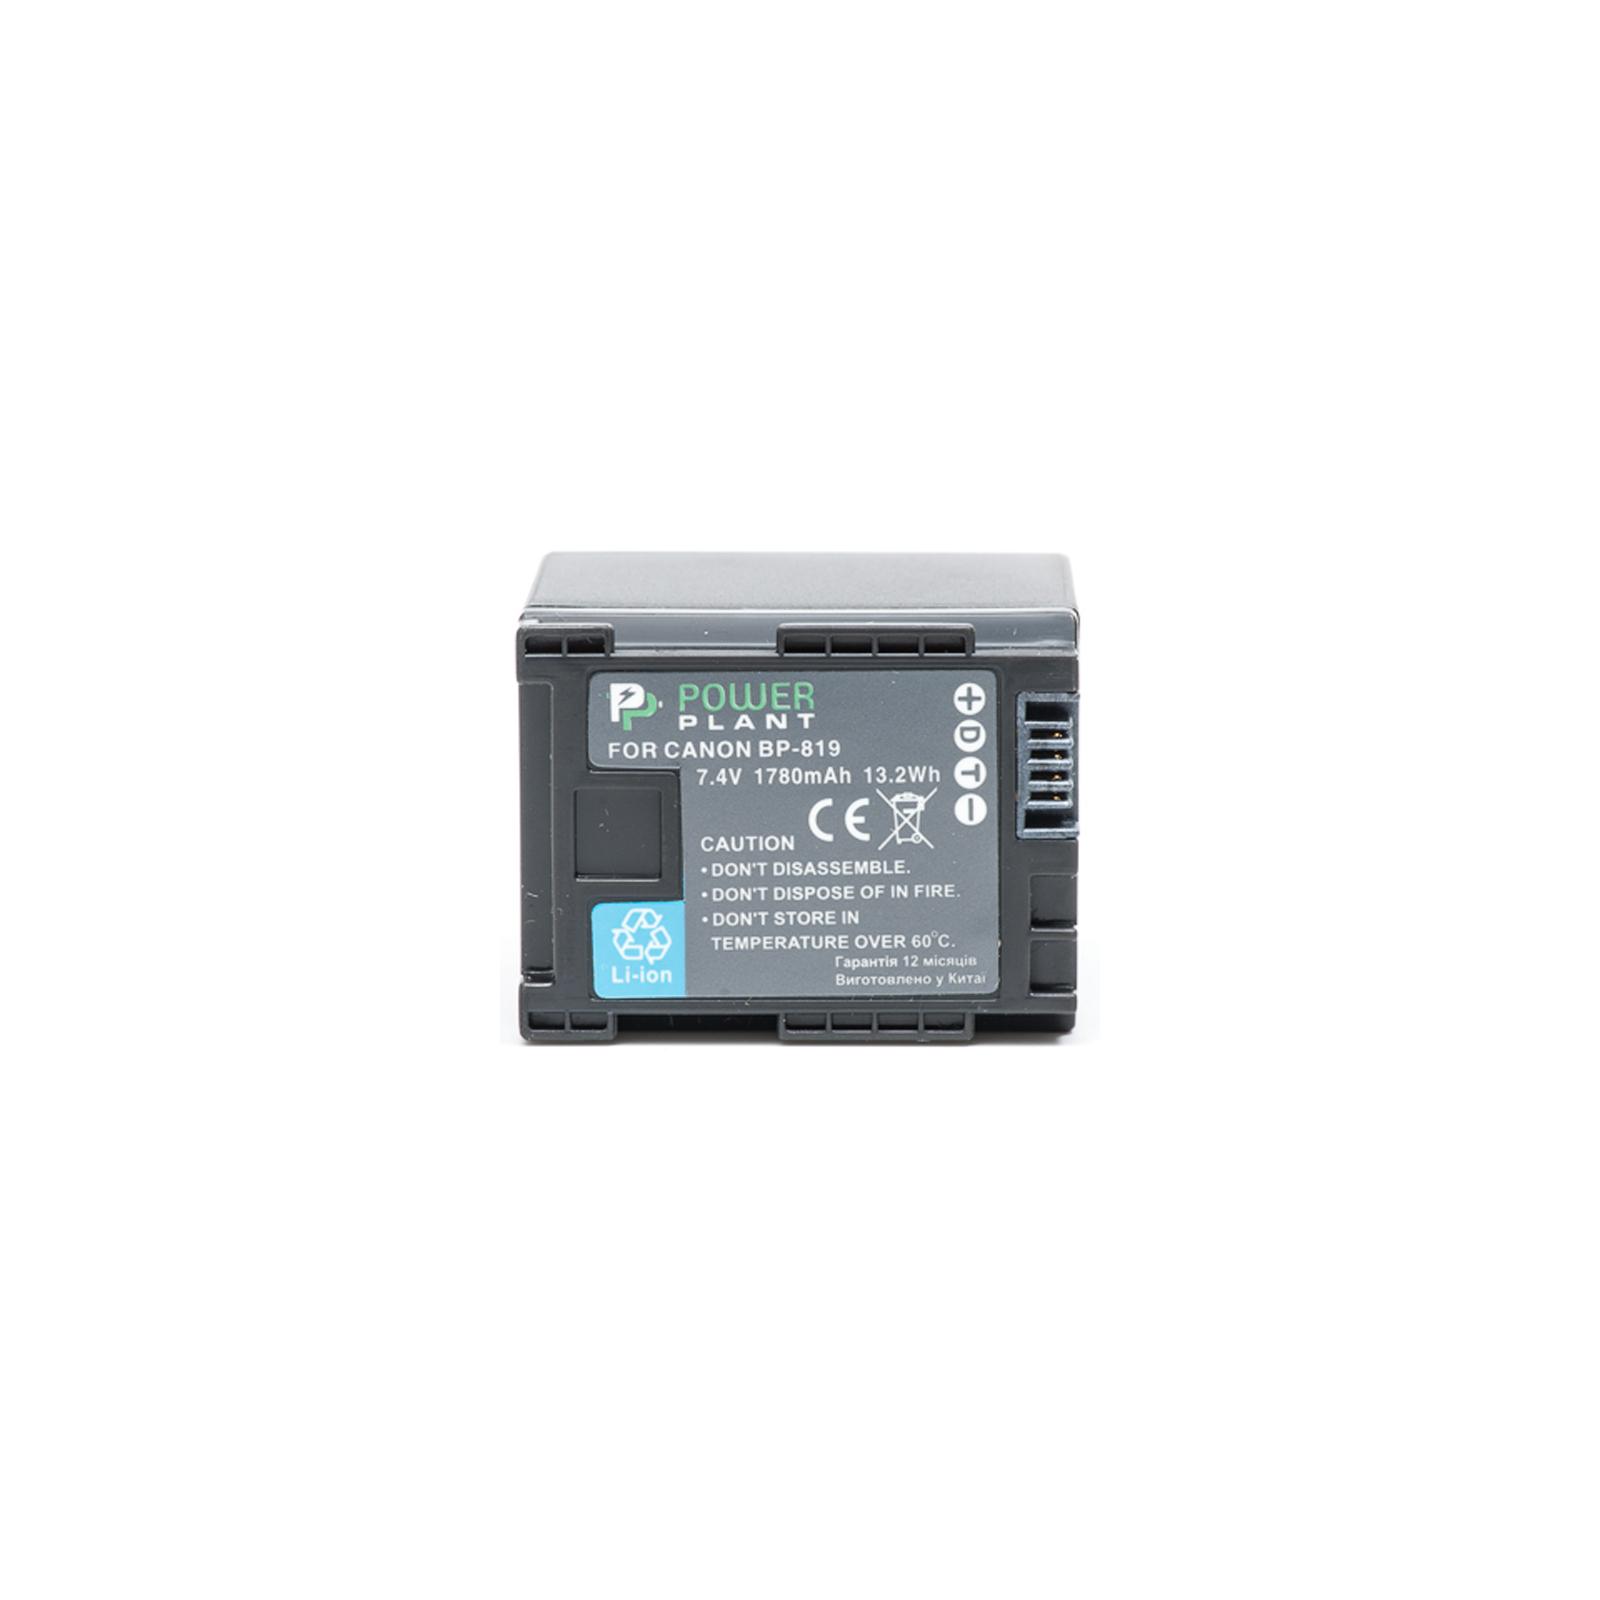 Аккумулятор к фото/видео PowerPlant Canon BP-819 Chip (DV00DV1245) изображение 2